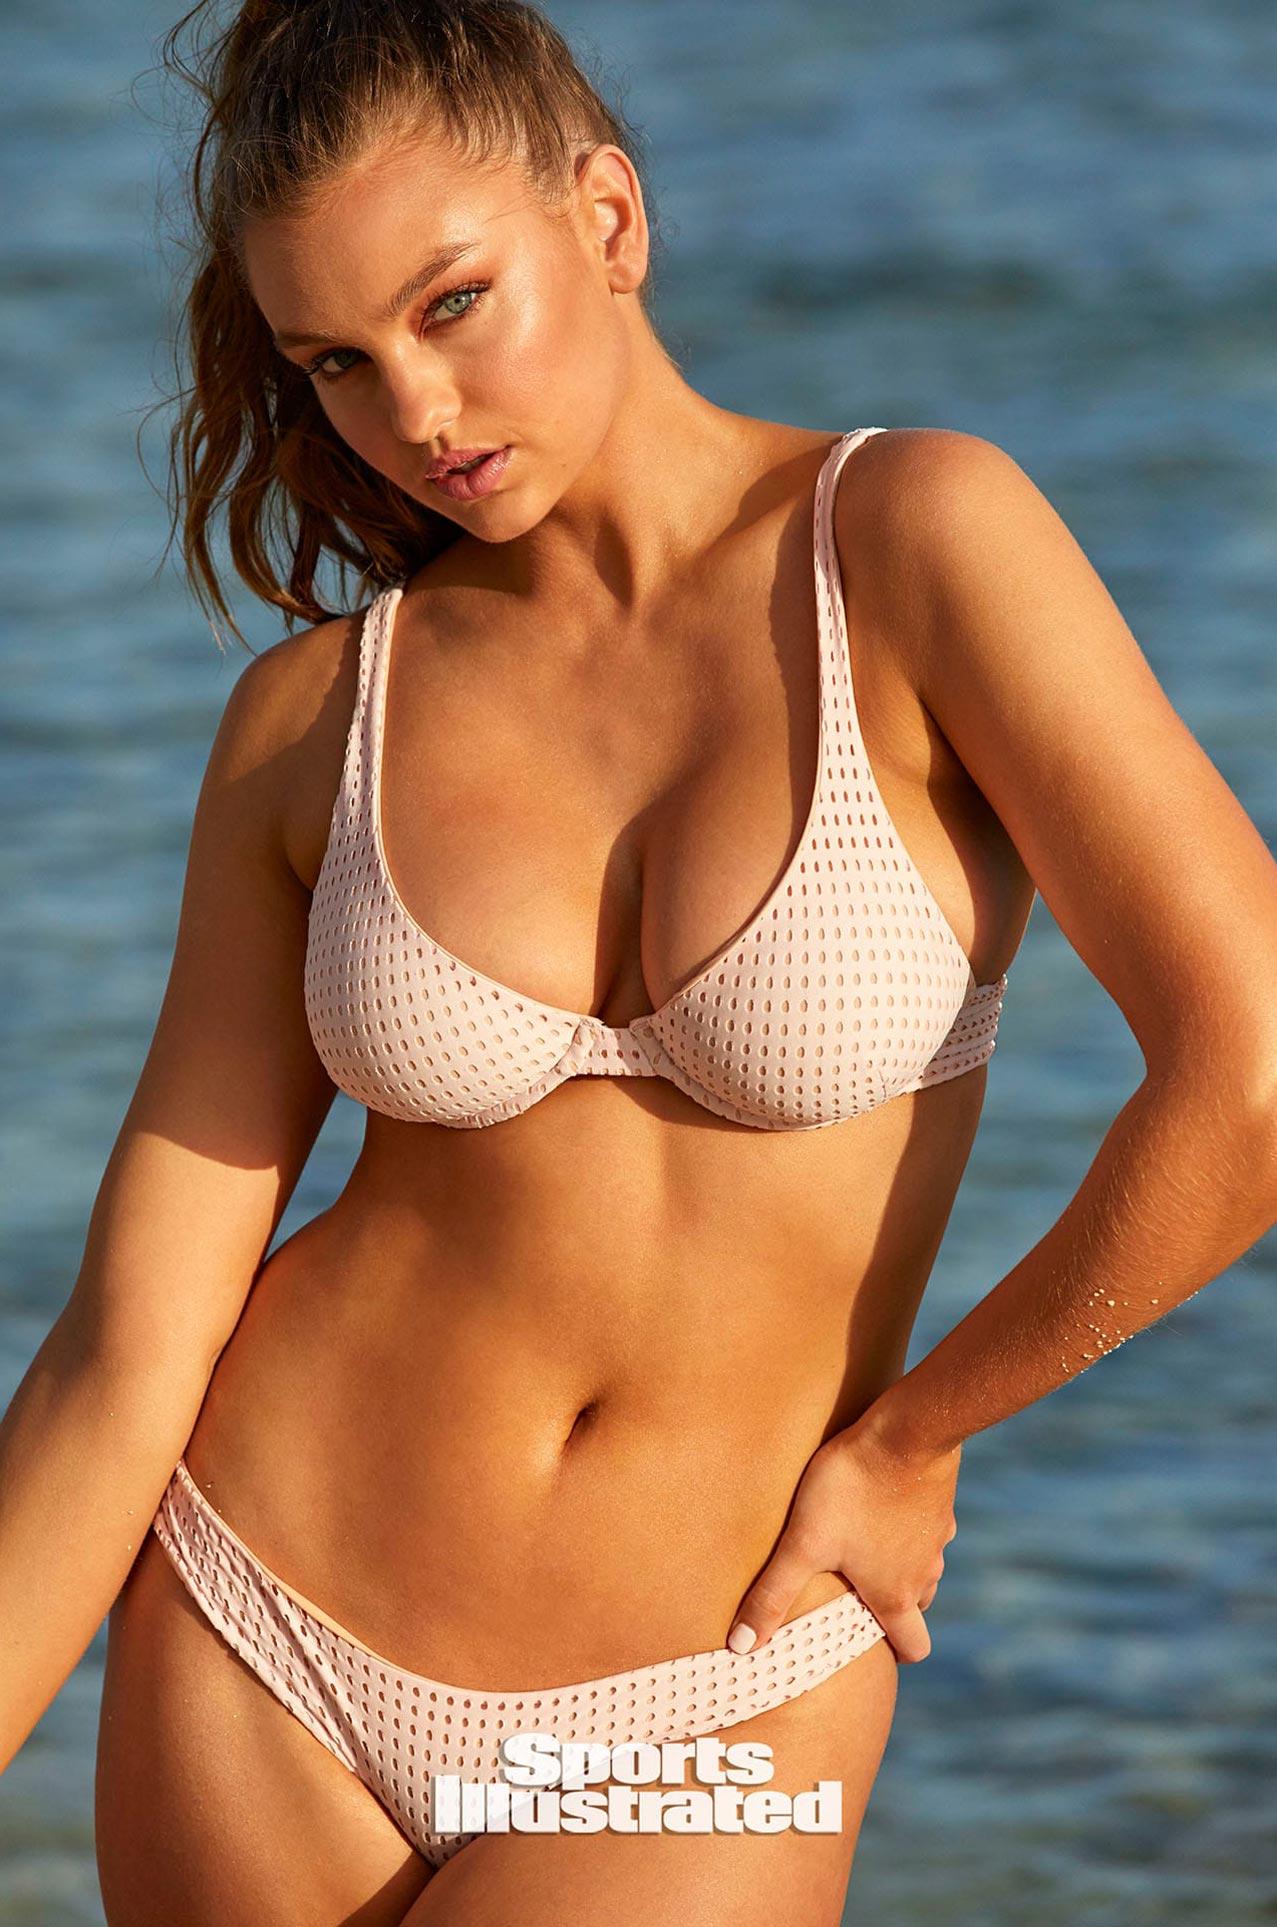 Оливия Брауэр в каталоге купальников Sports Illustrated Swimsuit 2020 / фото 12